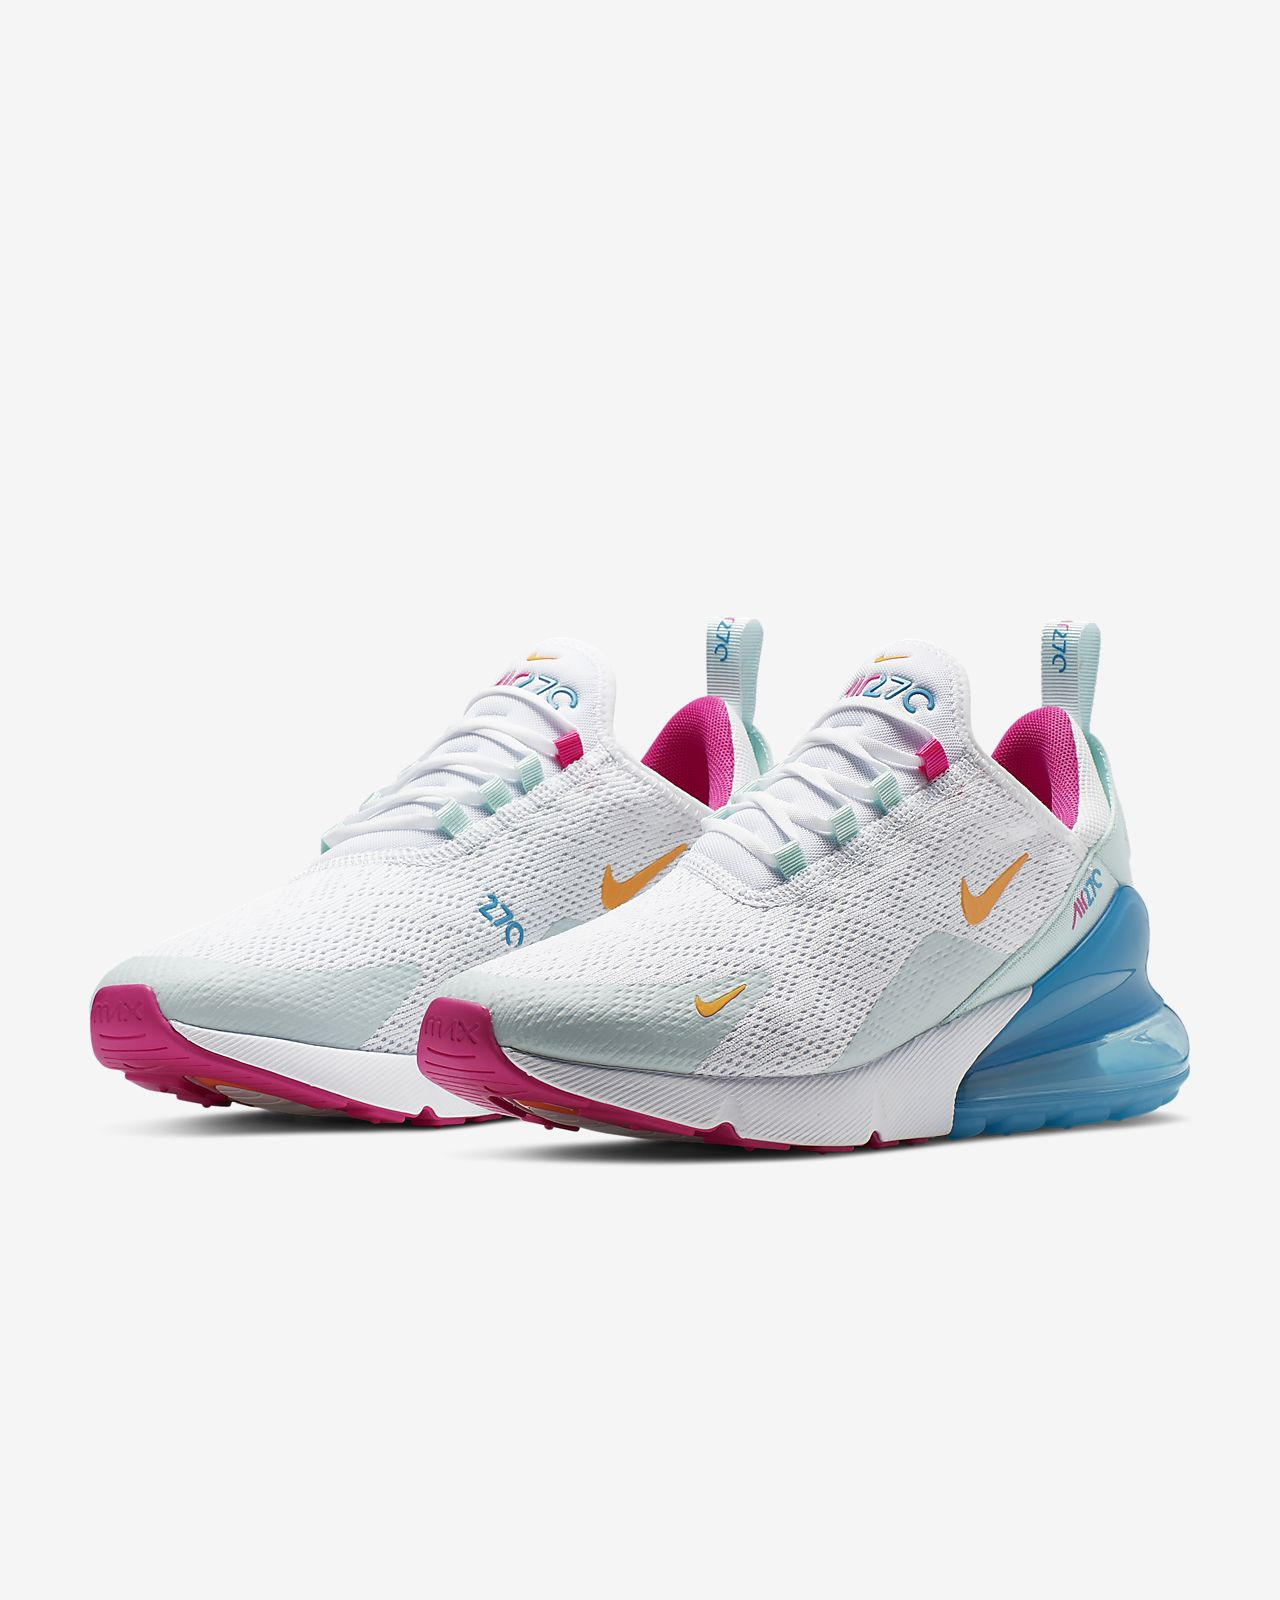 Nike Air Max 270 Pink | Sport | Sneakers nike, Nike shoes